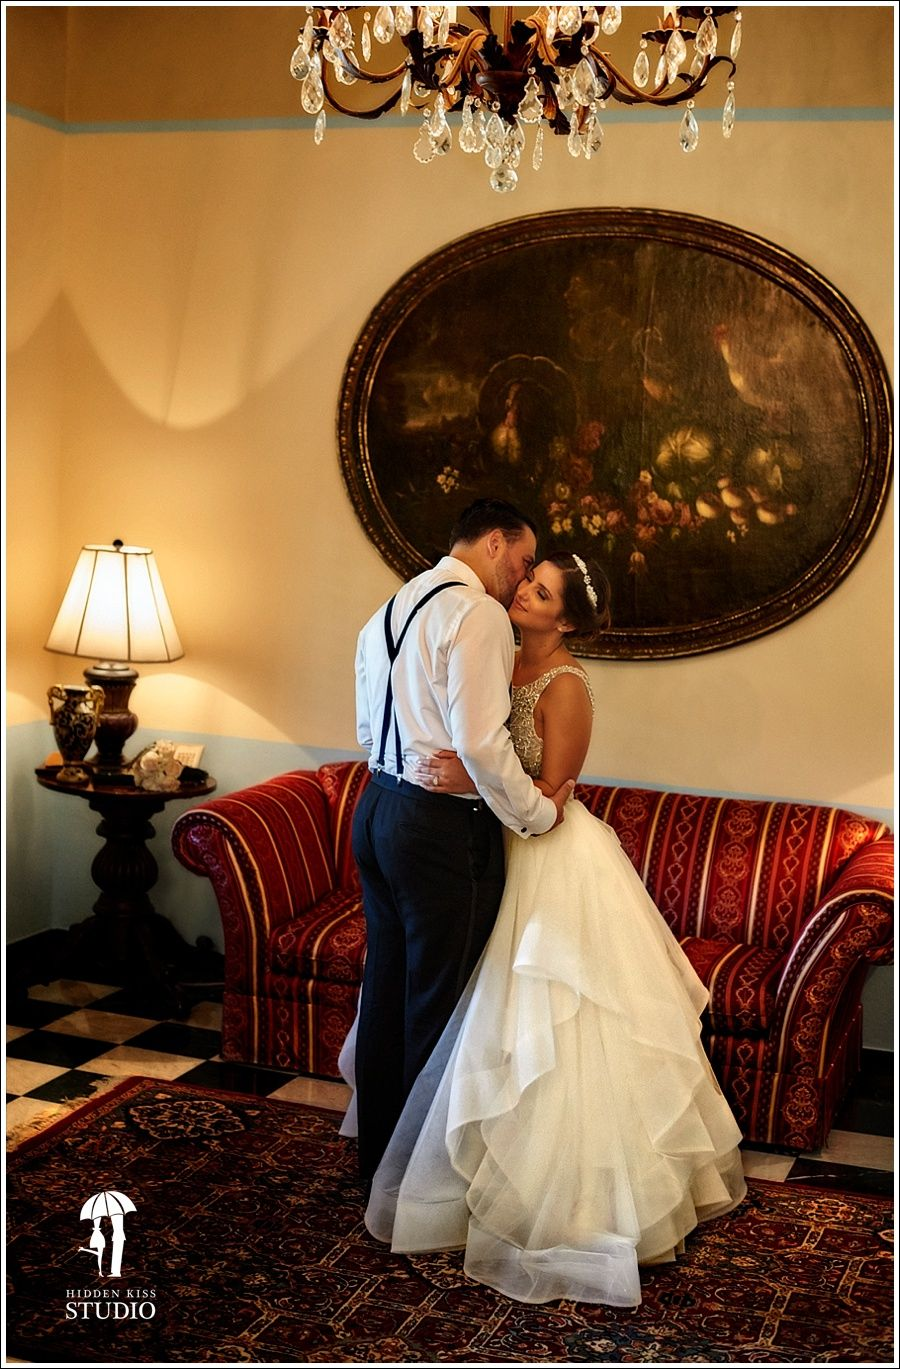 #DestinationWeddingPuertoRico #DestinationWedding #BrideandGroom #ElConvento #OldSanJuanWedding